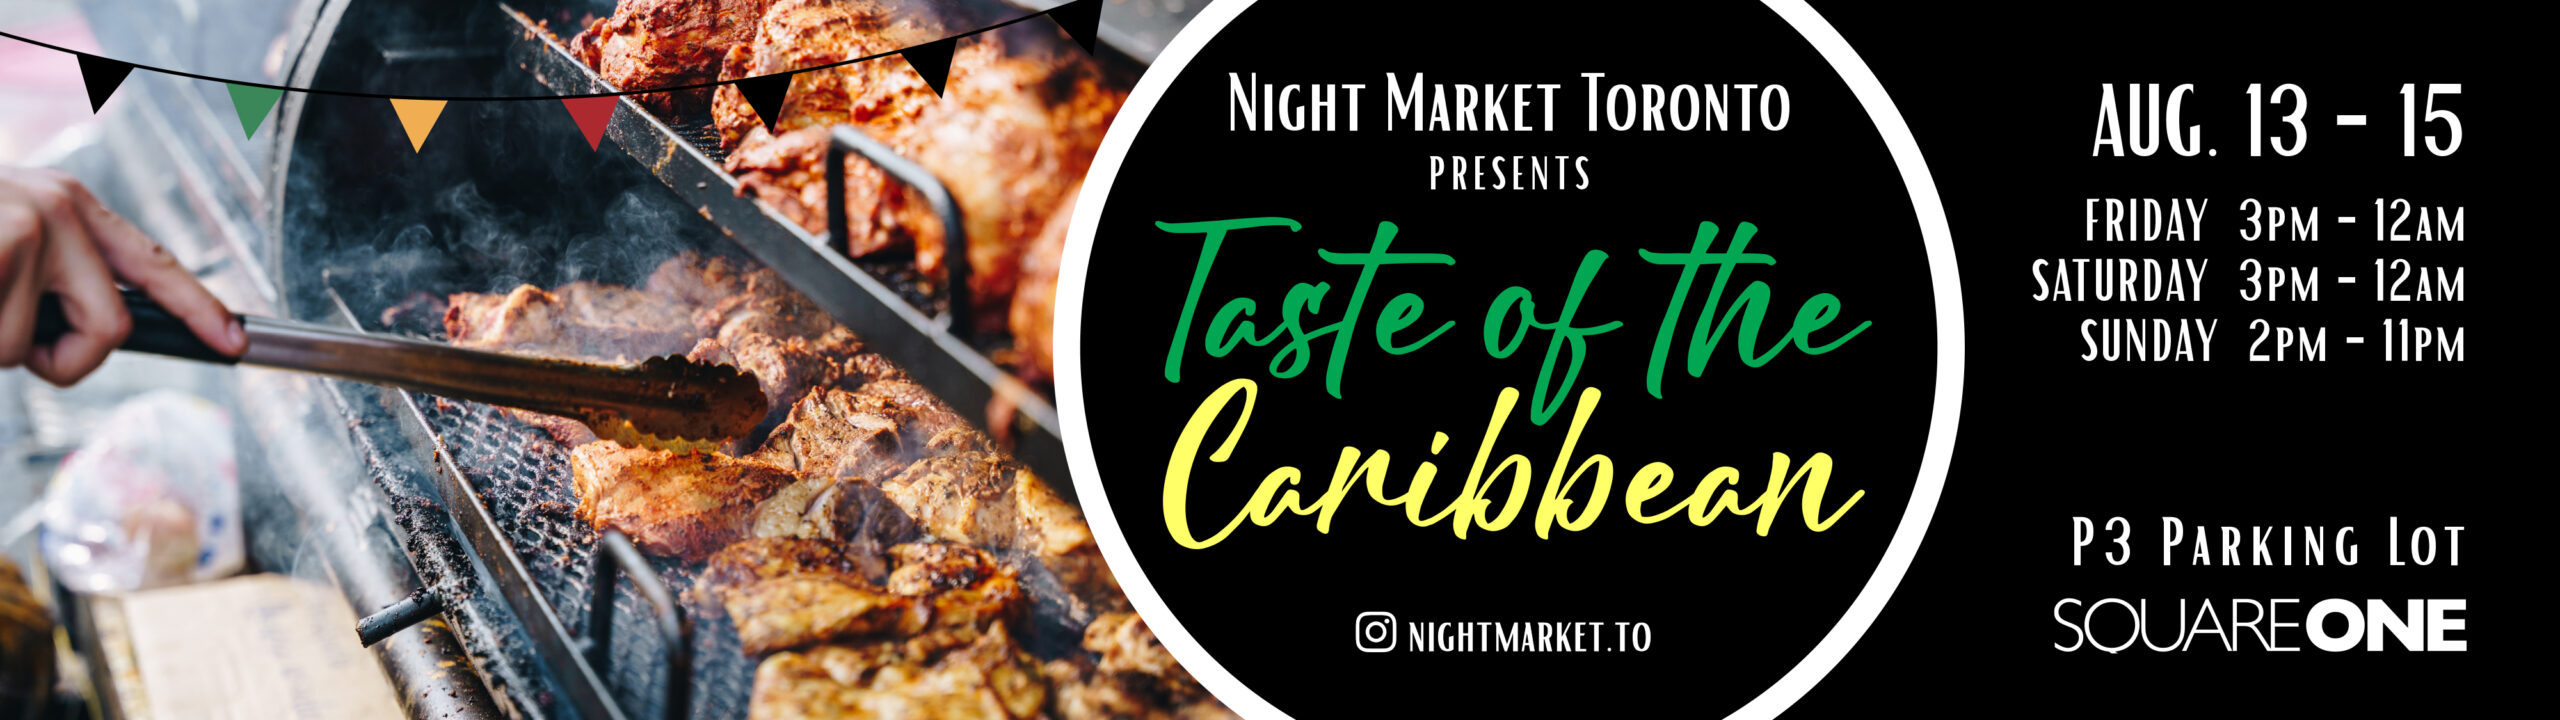 Night Market at SQ1